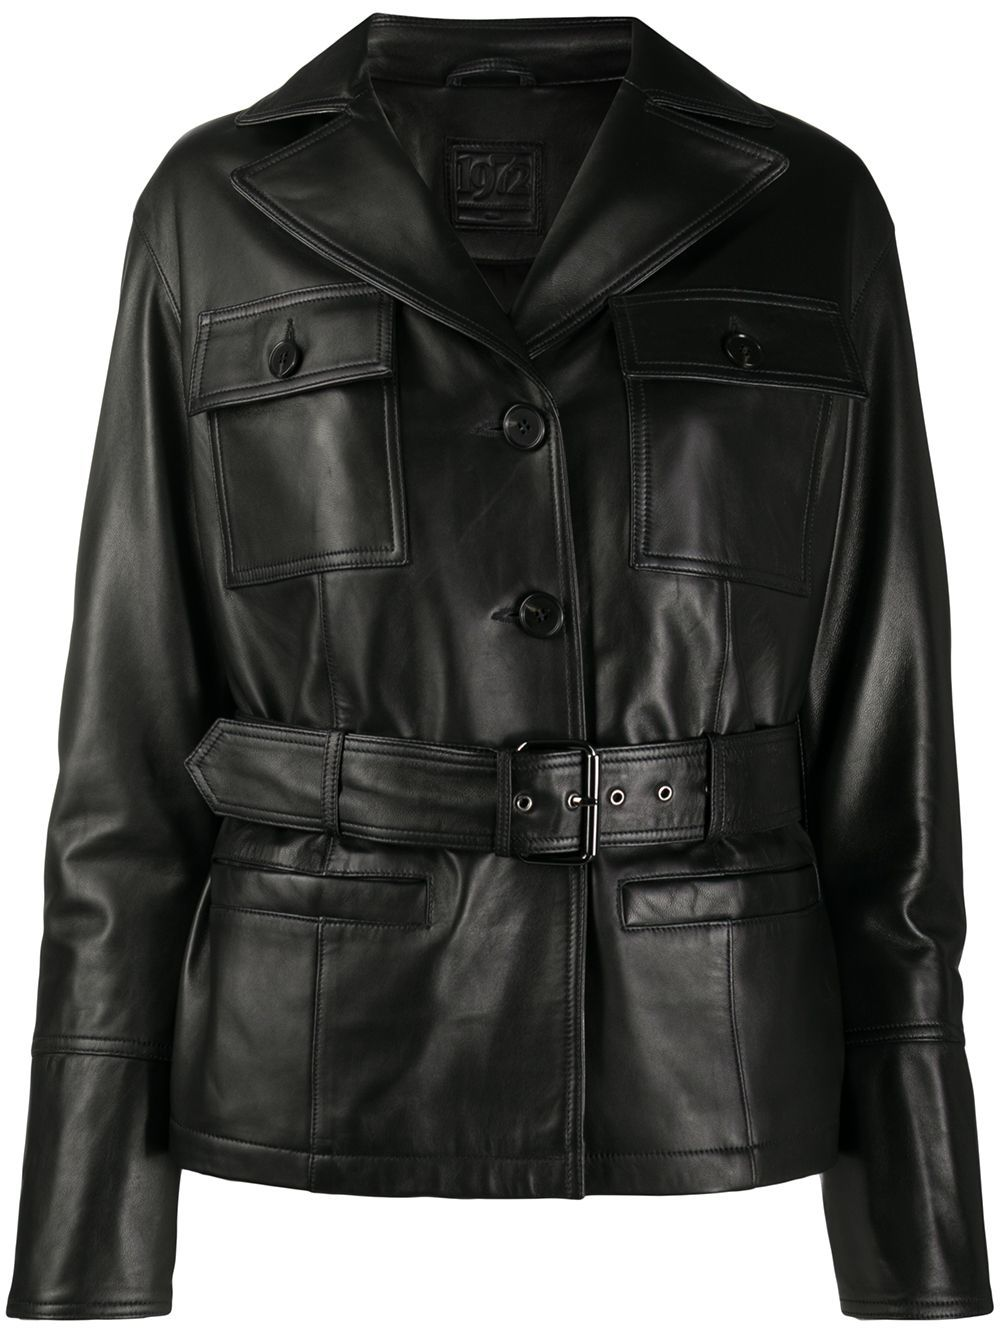 Desa 1972 Belted Leather Jacket Leather Jacket Real Leather Jacket Leather Jacket Black [ 1334 x 1000 Pixel ]